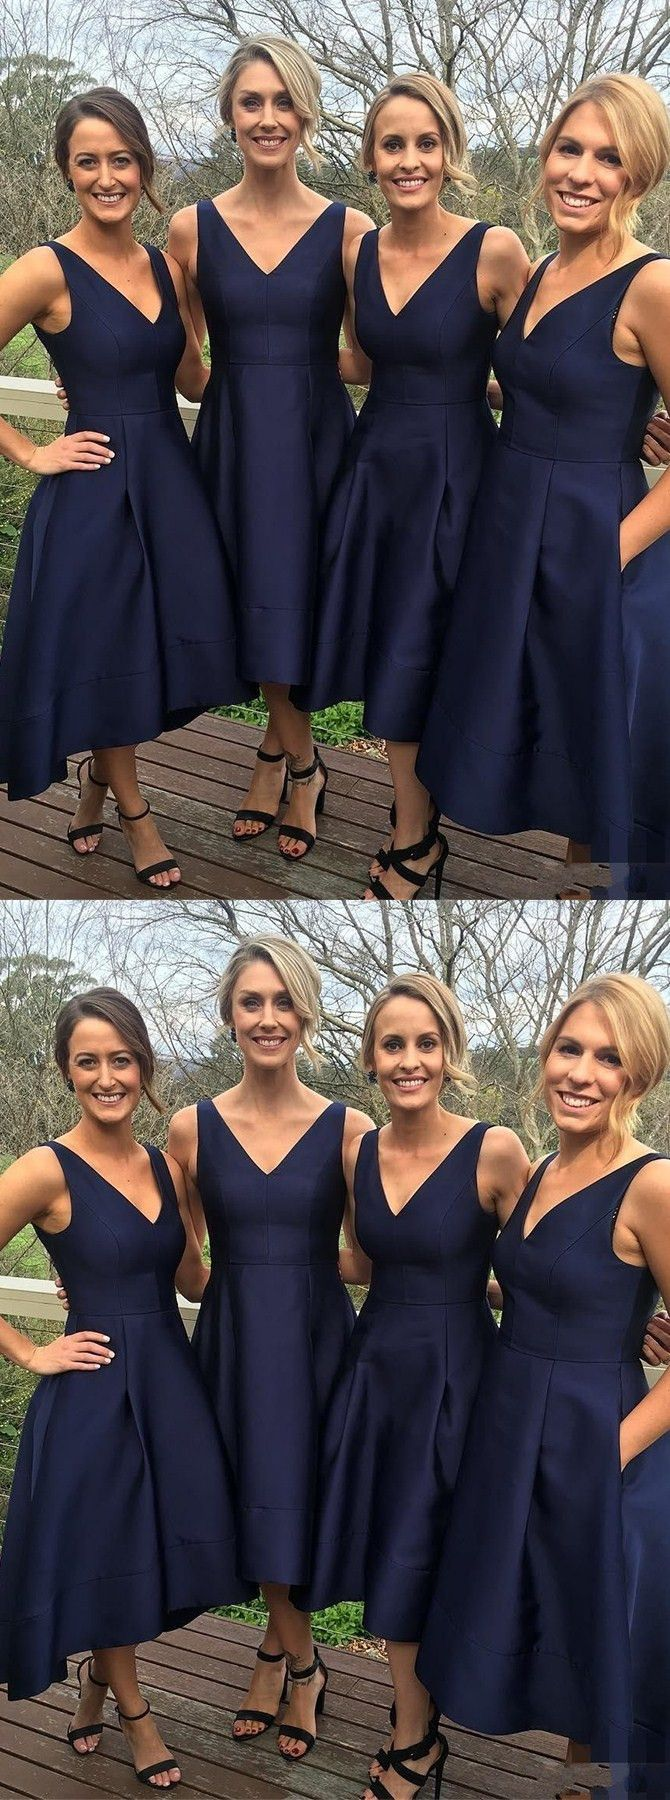 Aline vneck sleeveless hilow navy blue satin bridesmaid dress